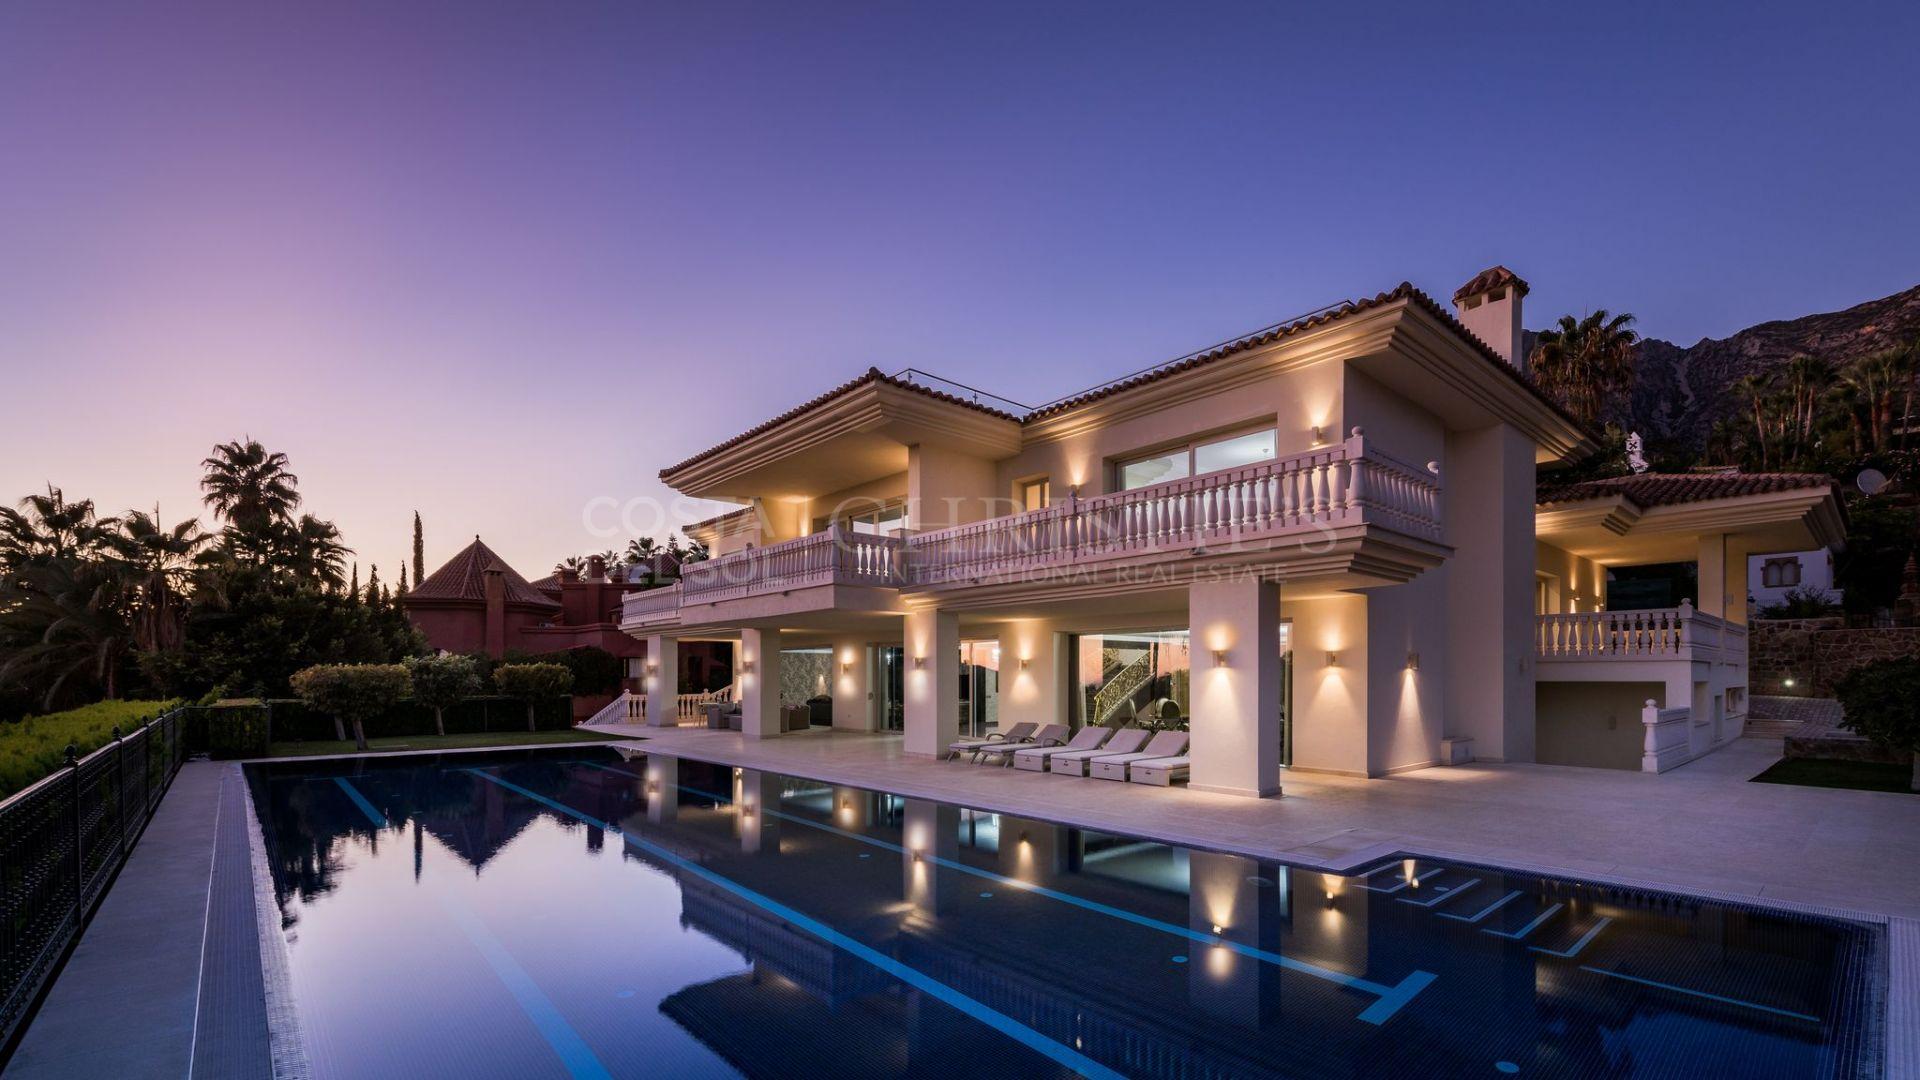 Incredible villa in Sierra Blanca, Marbella Golden Mile | Christie's International Real Estate